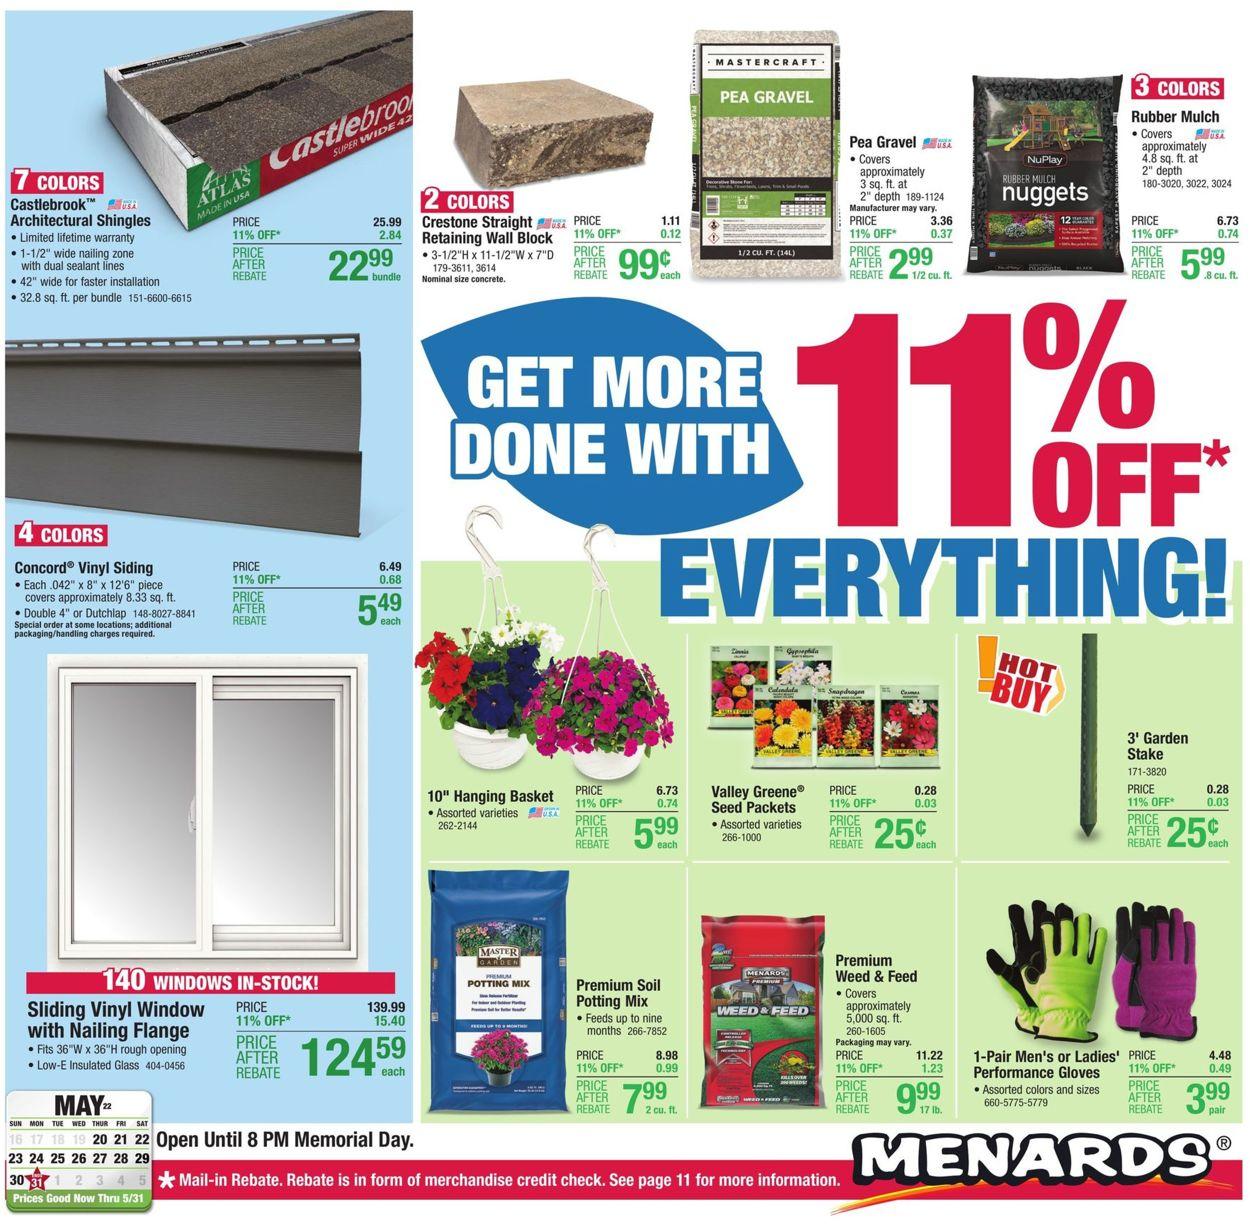 Menards Weekly Ad Circular - valid 05/20-05/31/2021